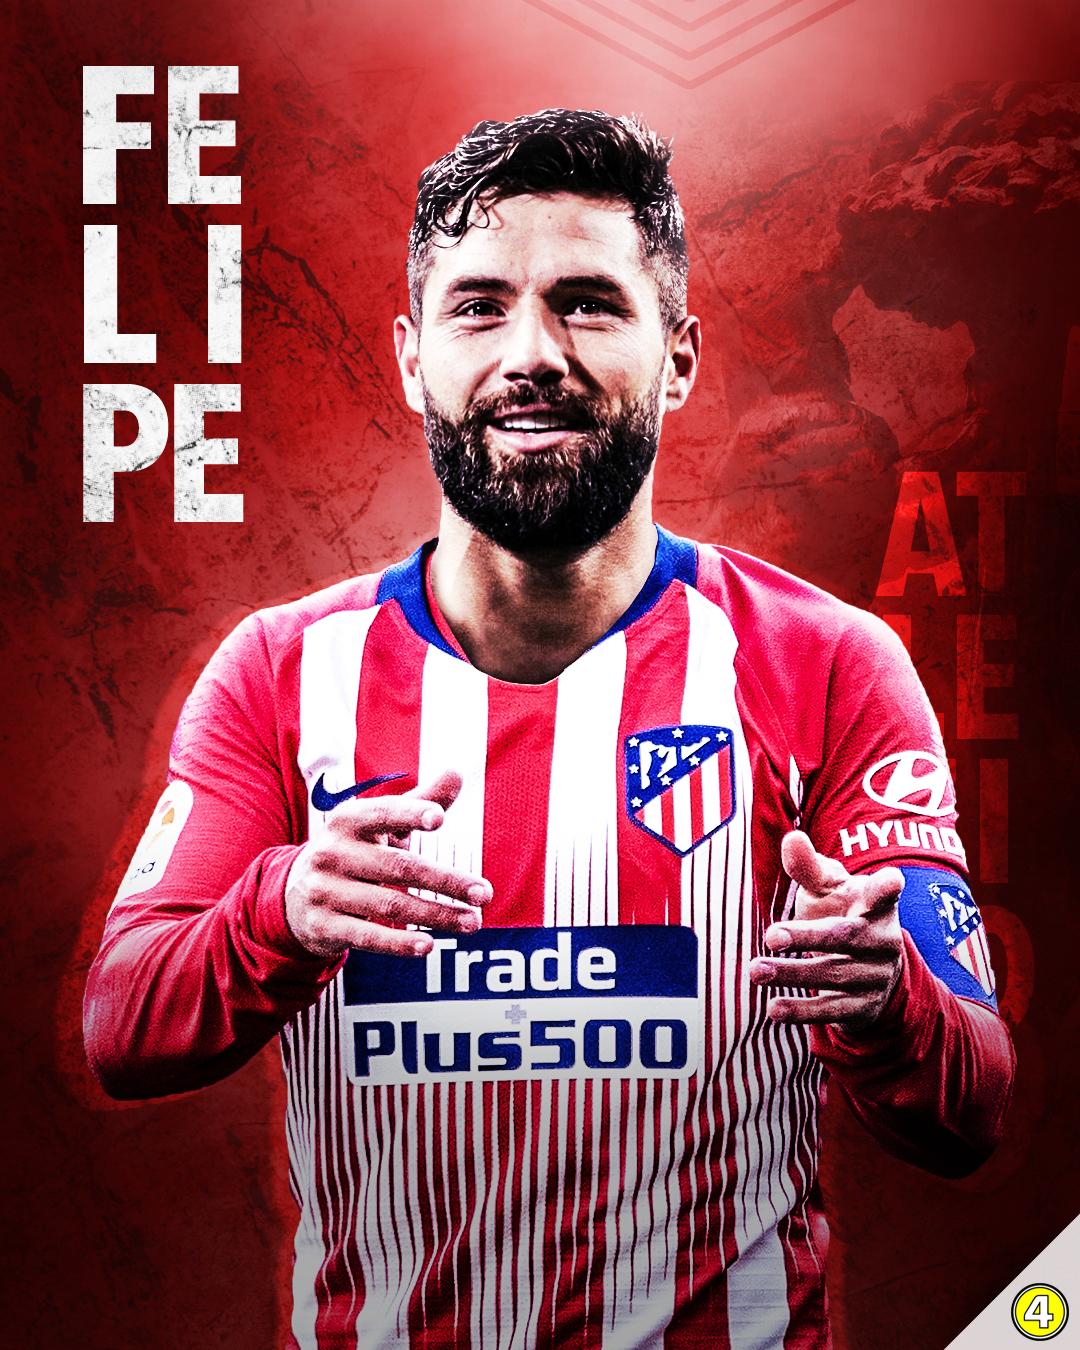 Felipe Atletico Madrid Transfer Mts Media